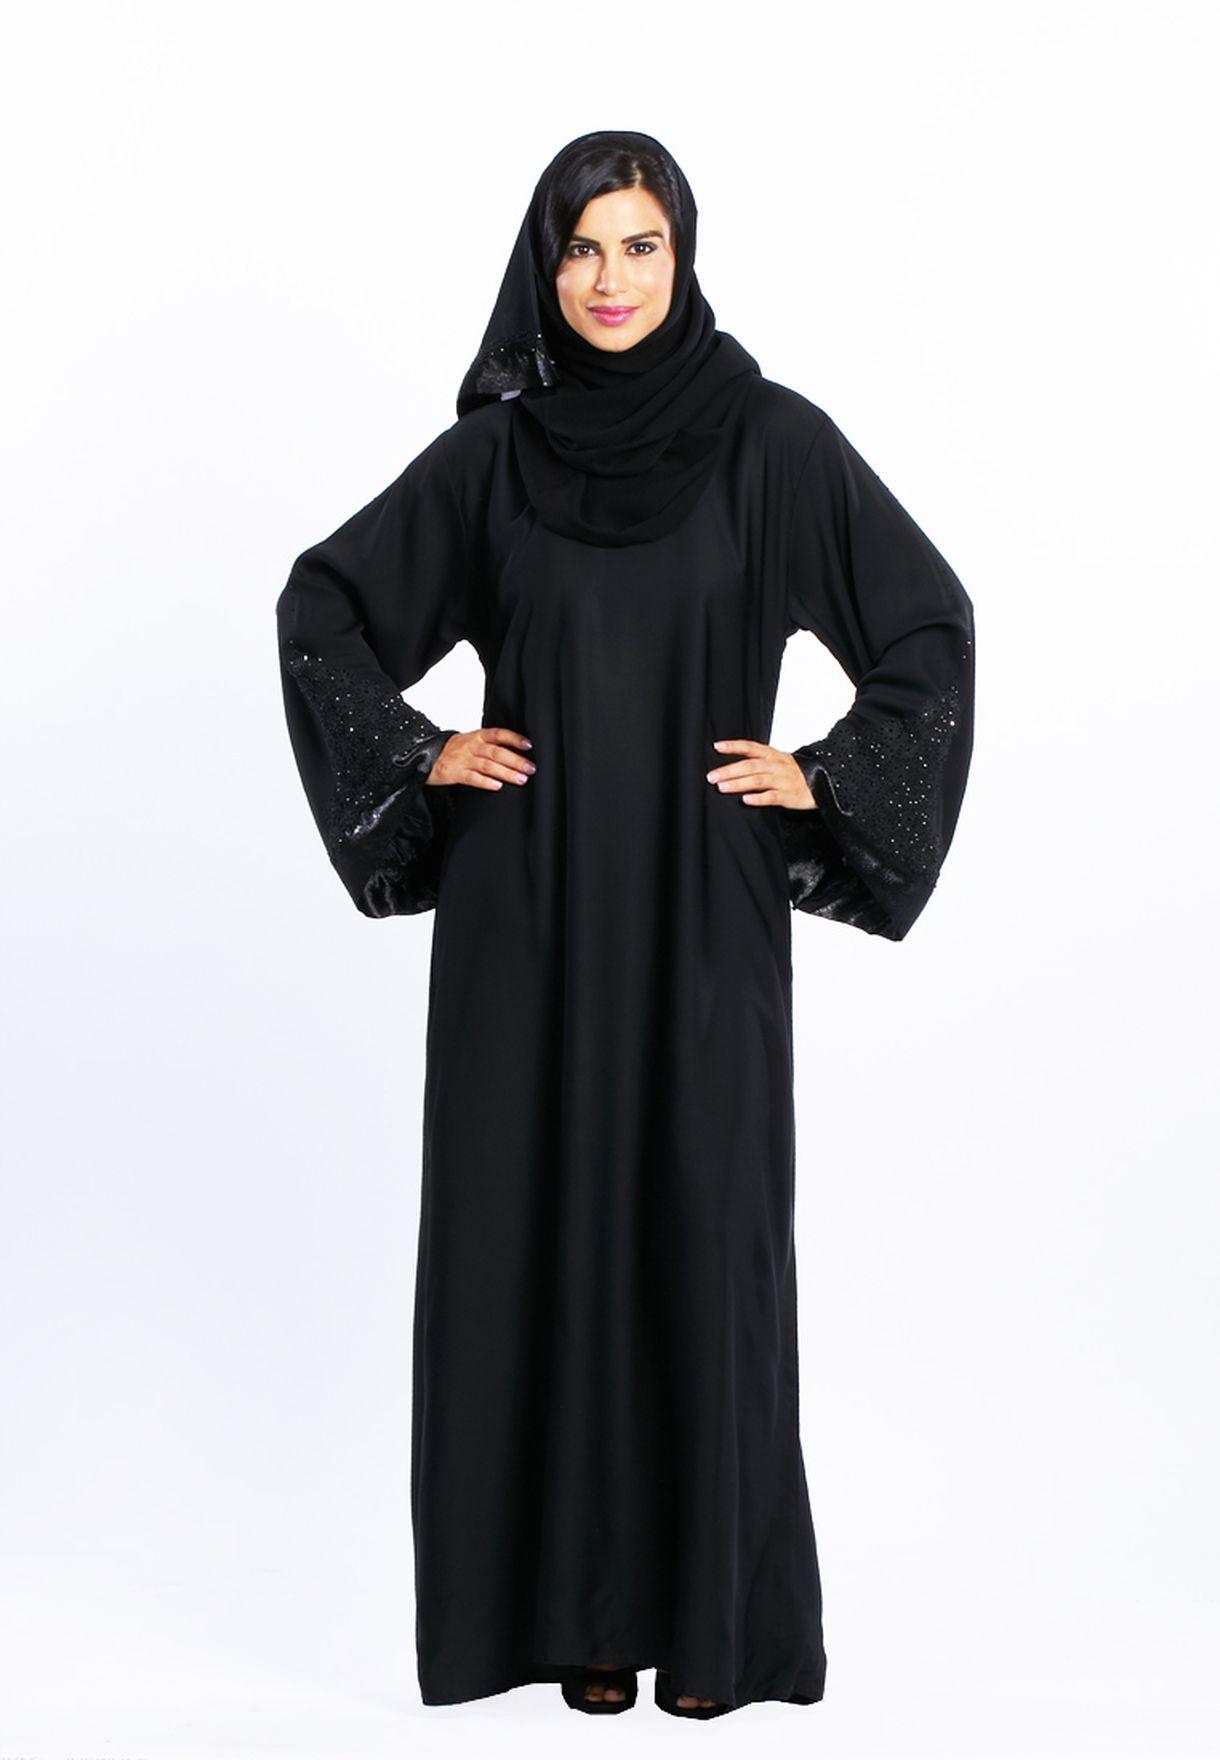 3b4570dd5 تسوق Embellished Abaya ماركة هيا كلوزيت لون أسود في البحرين ...